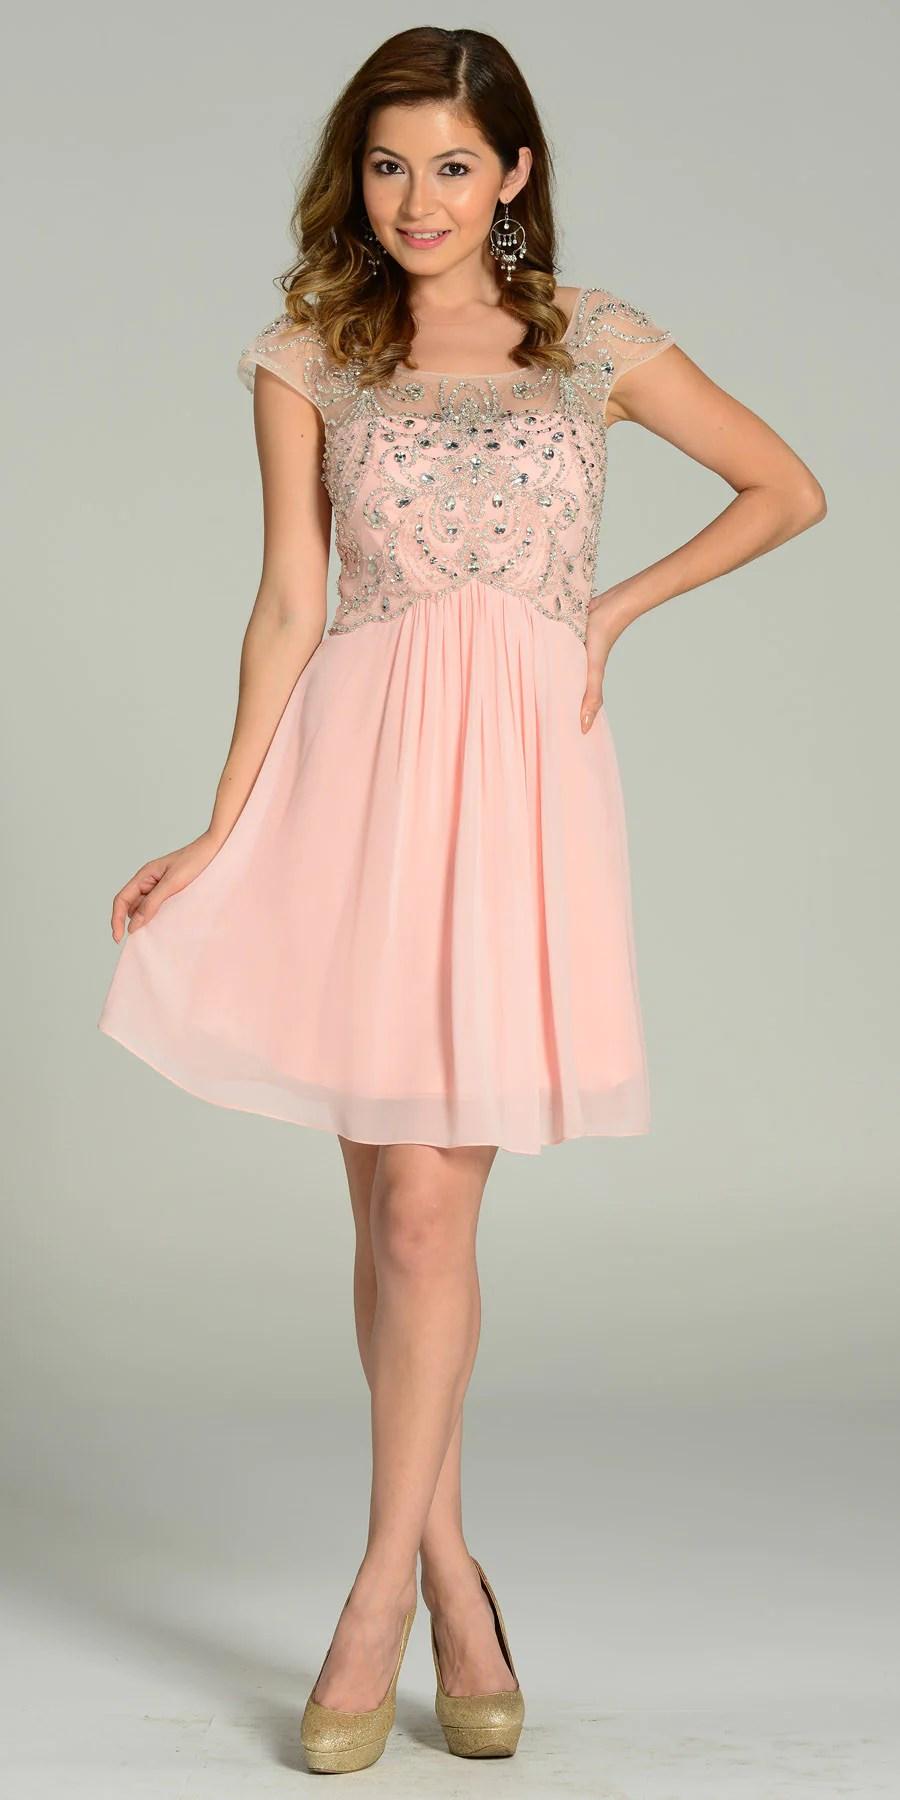 Short Empire Waist Chiffon Dress with Sleeves